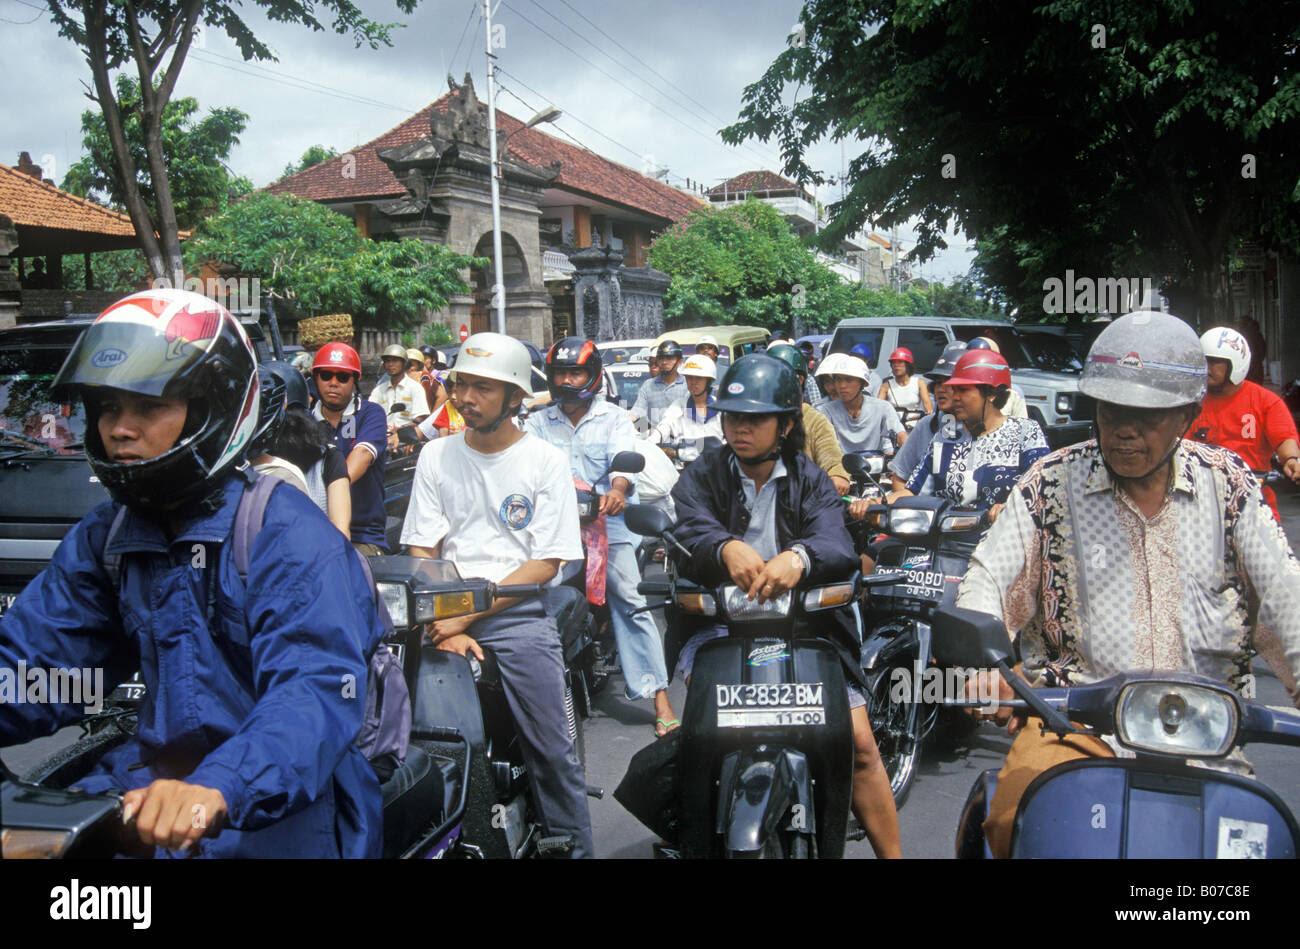 Bali Denpasar City Traffic Indonesia Stock Photo, Royalty ...